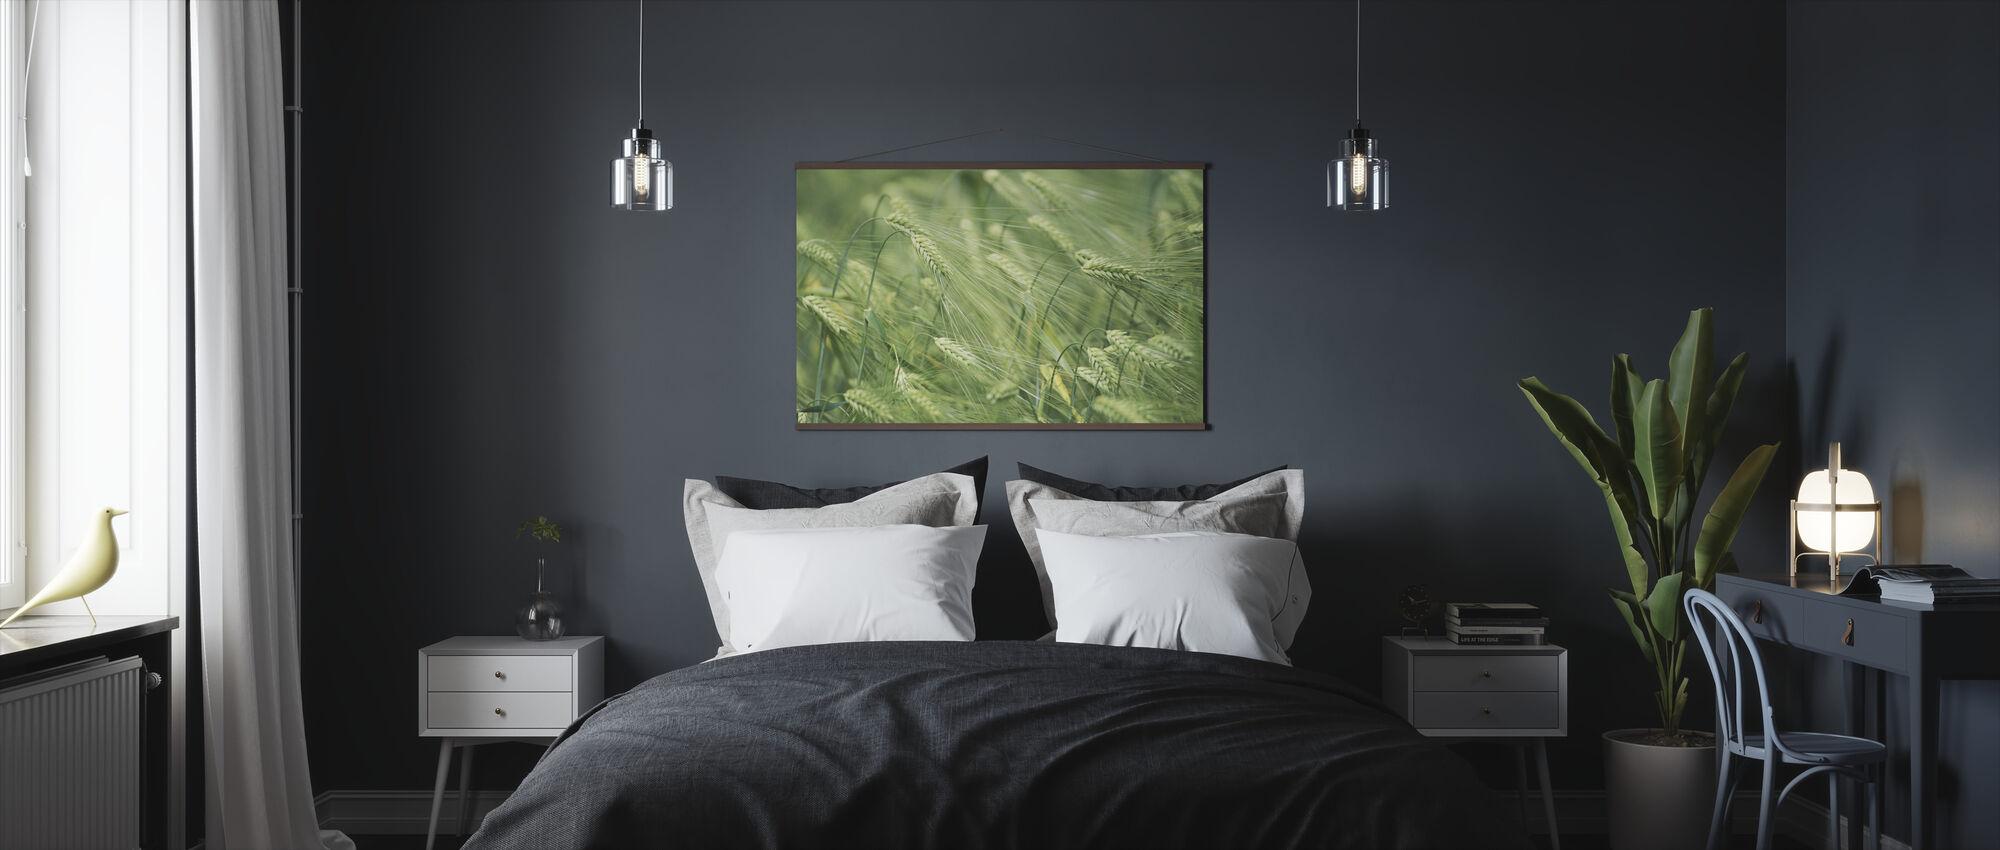 Barley Heads - Poster - Bedroom